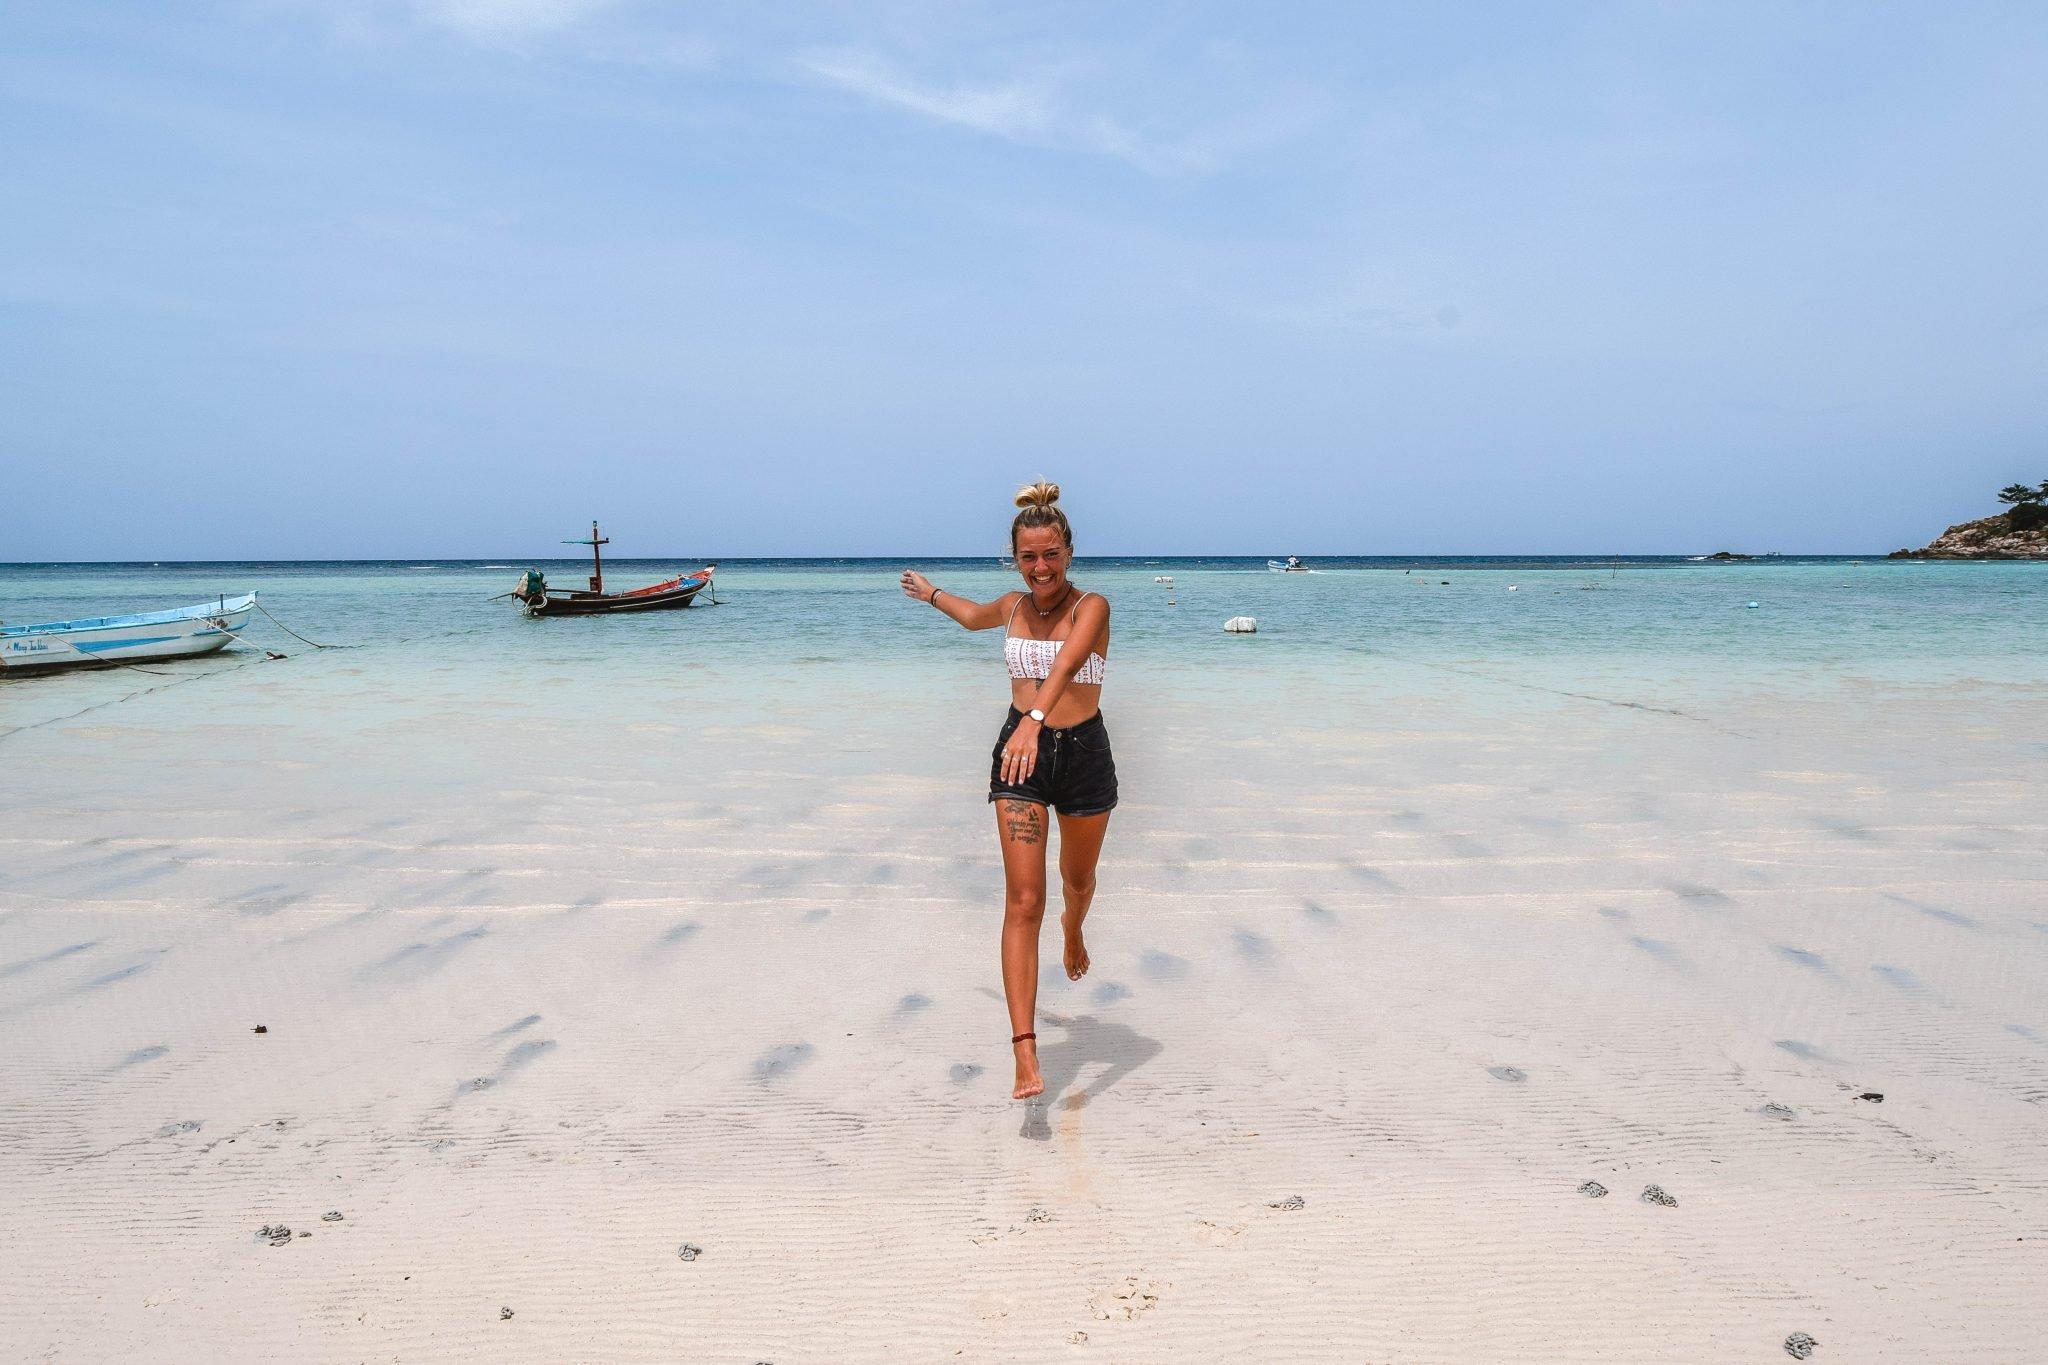 Wanderers & Warriors - Charlie & Lauren UK Travel Couple - Chalok Baan Kao Bay - things to do on Koh Tao Beach - Koh Tao Beaches In Koh Tao